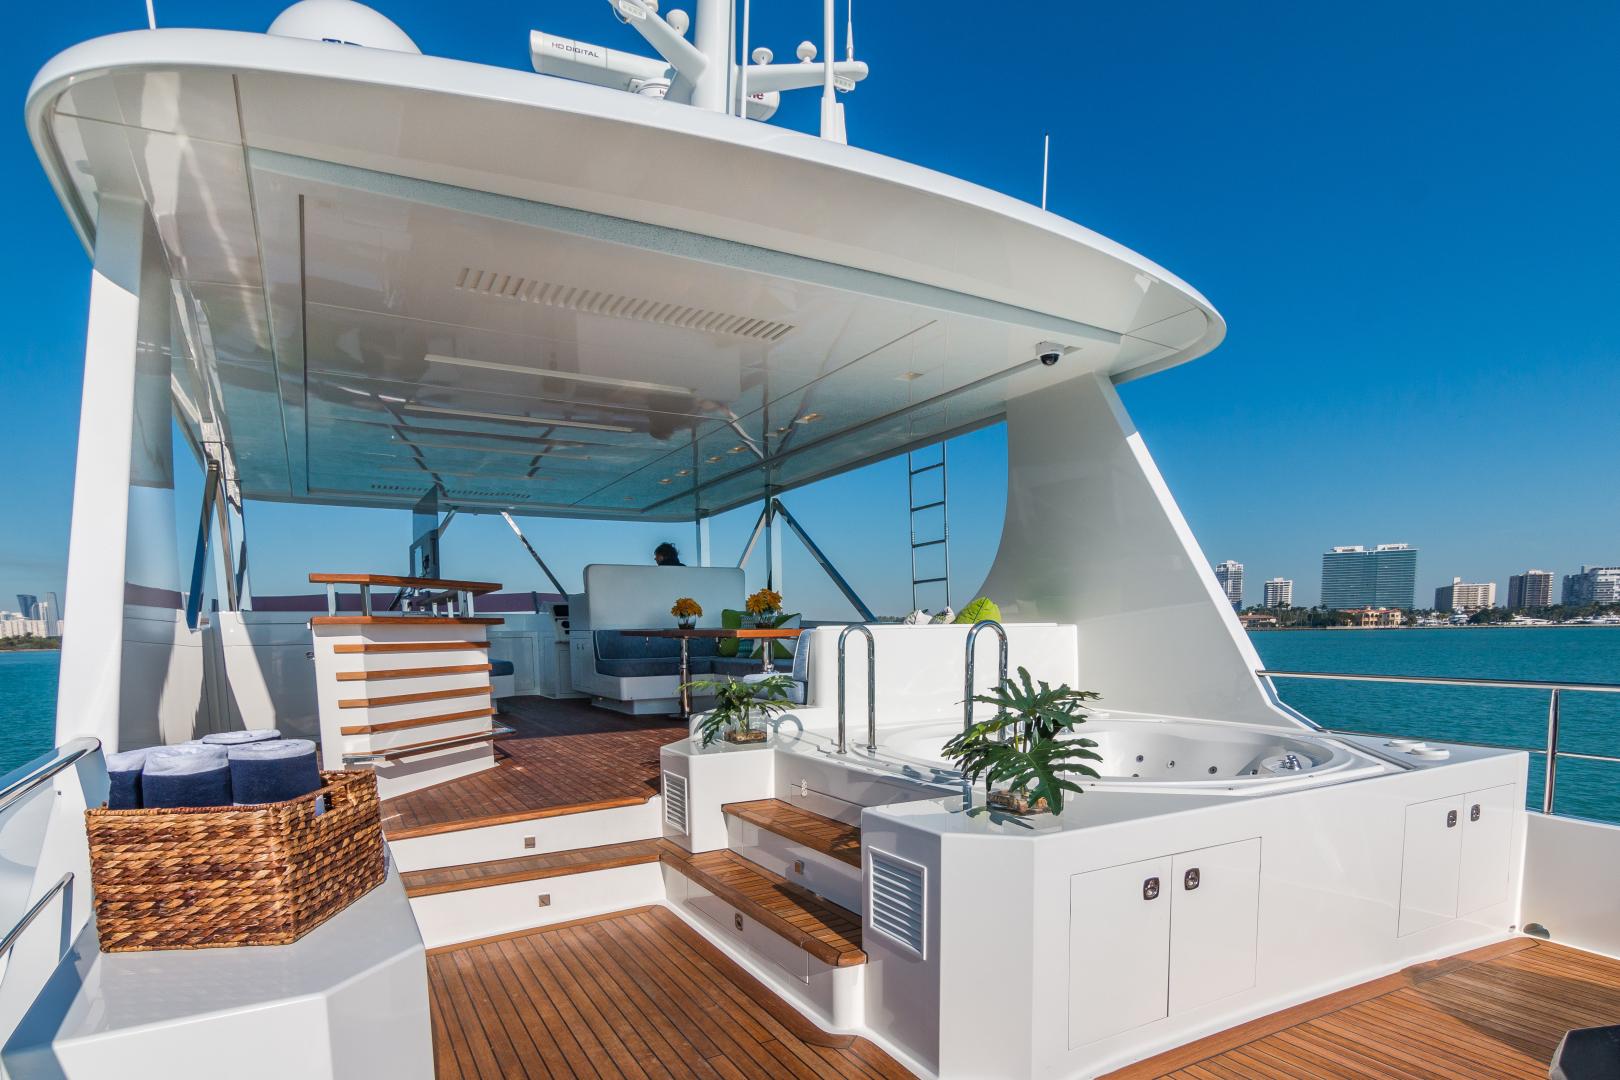 Vicem-Raised Pilot House 2013-MONI FORT LAUDERDALE-Florida-United States-SUN DECK -1394884 | Thumbnail